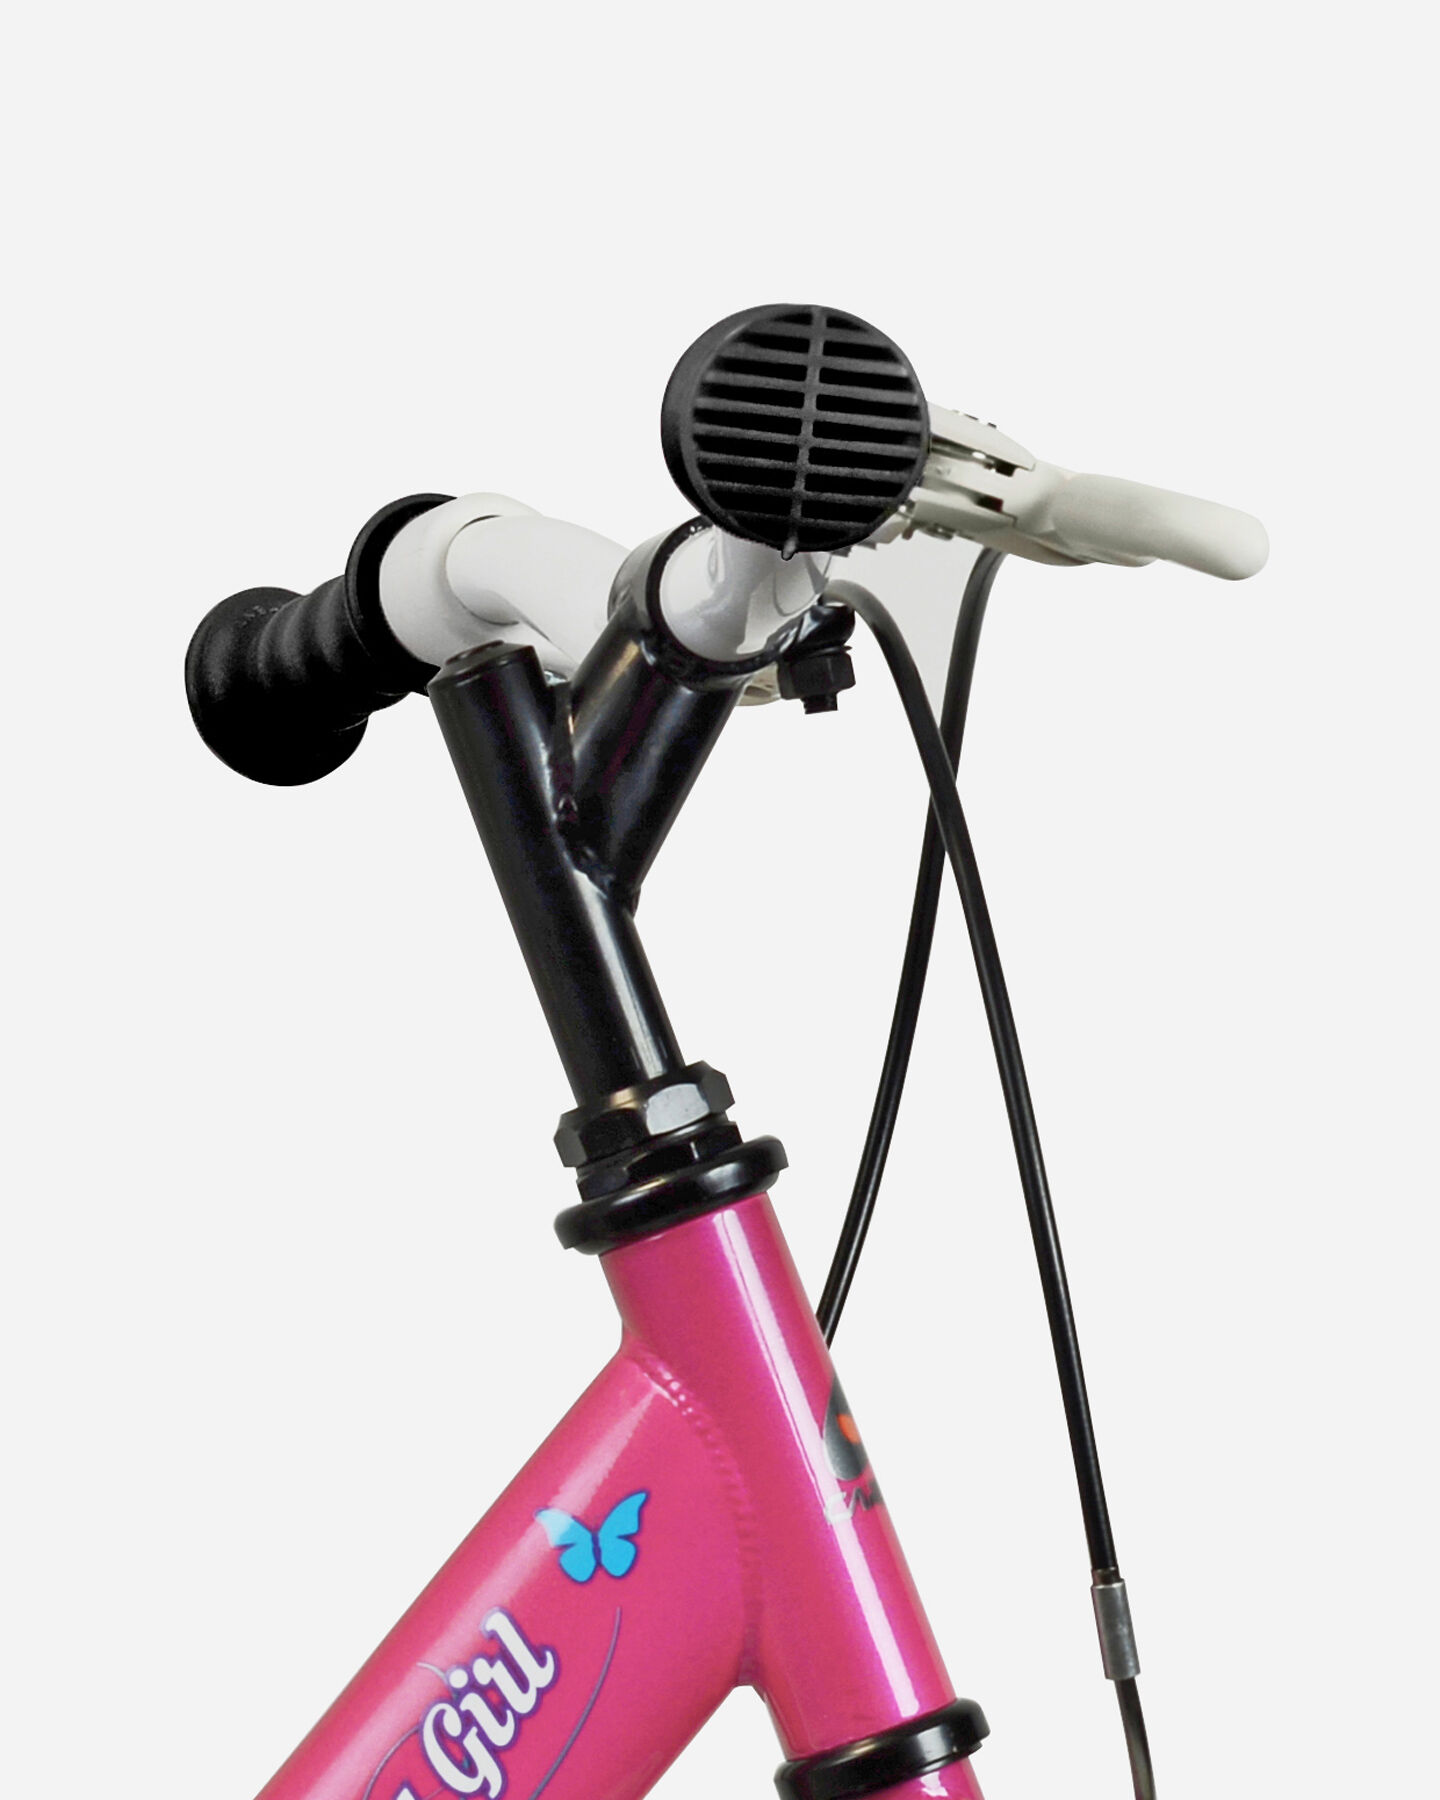 "Bici junior CARNIELLI BIKE 14"" JR S4025976|-|UNI scatto 2"